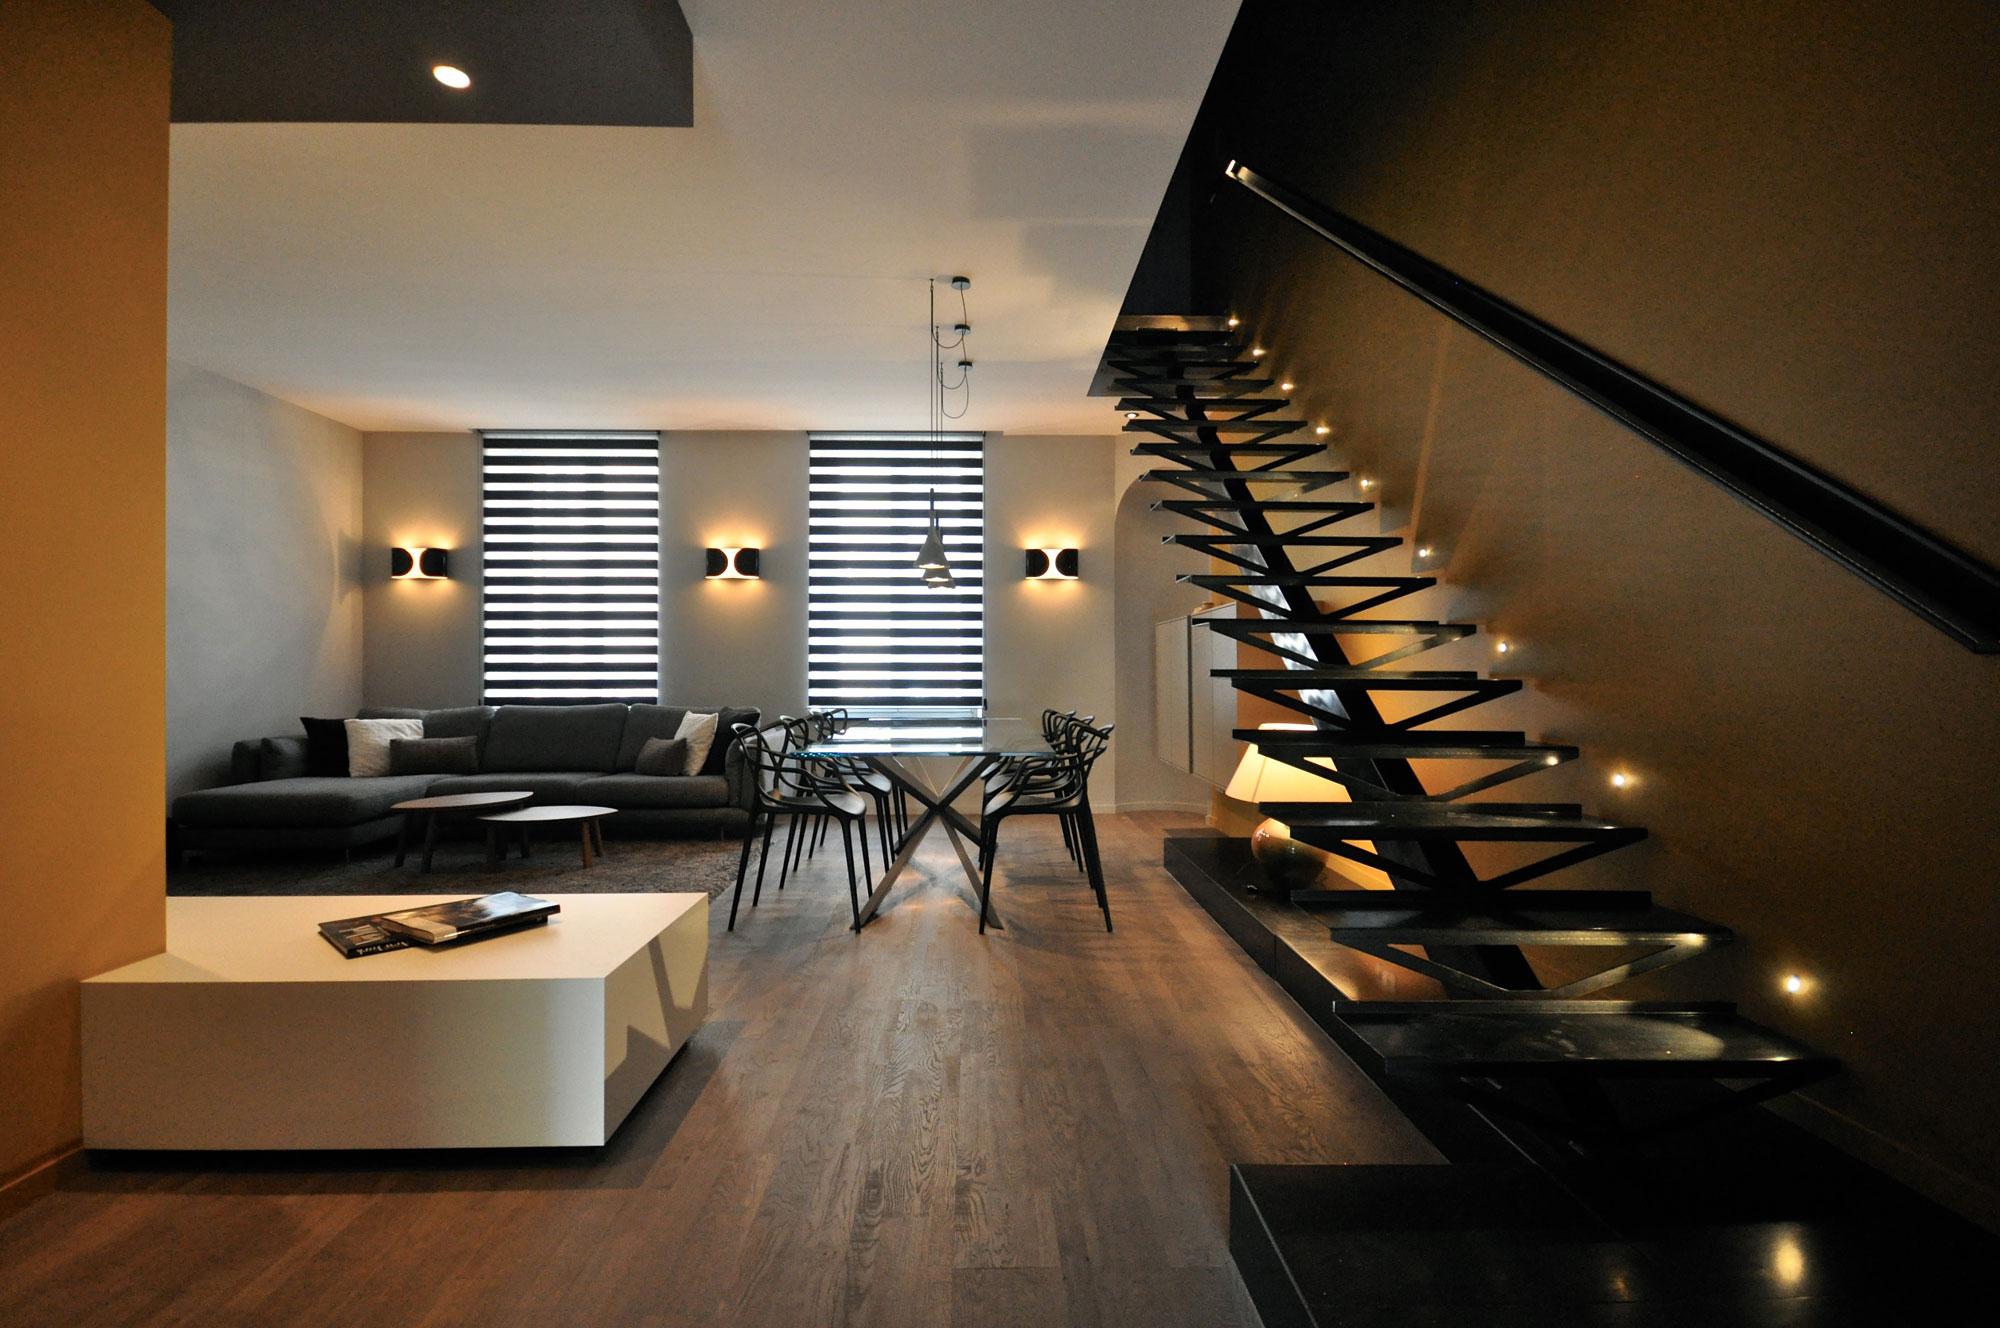 Luxury 150m2 duplex apartment near parc sainte marie in for Duplex interior designs